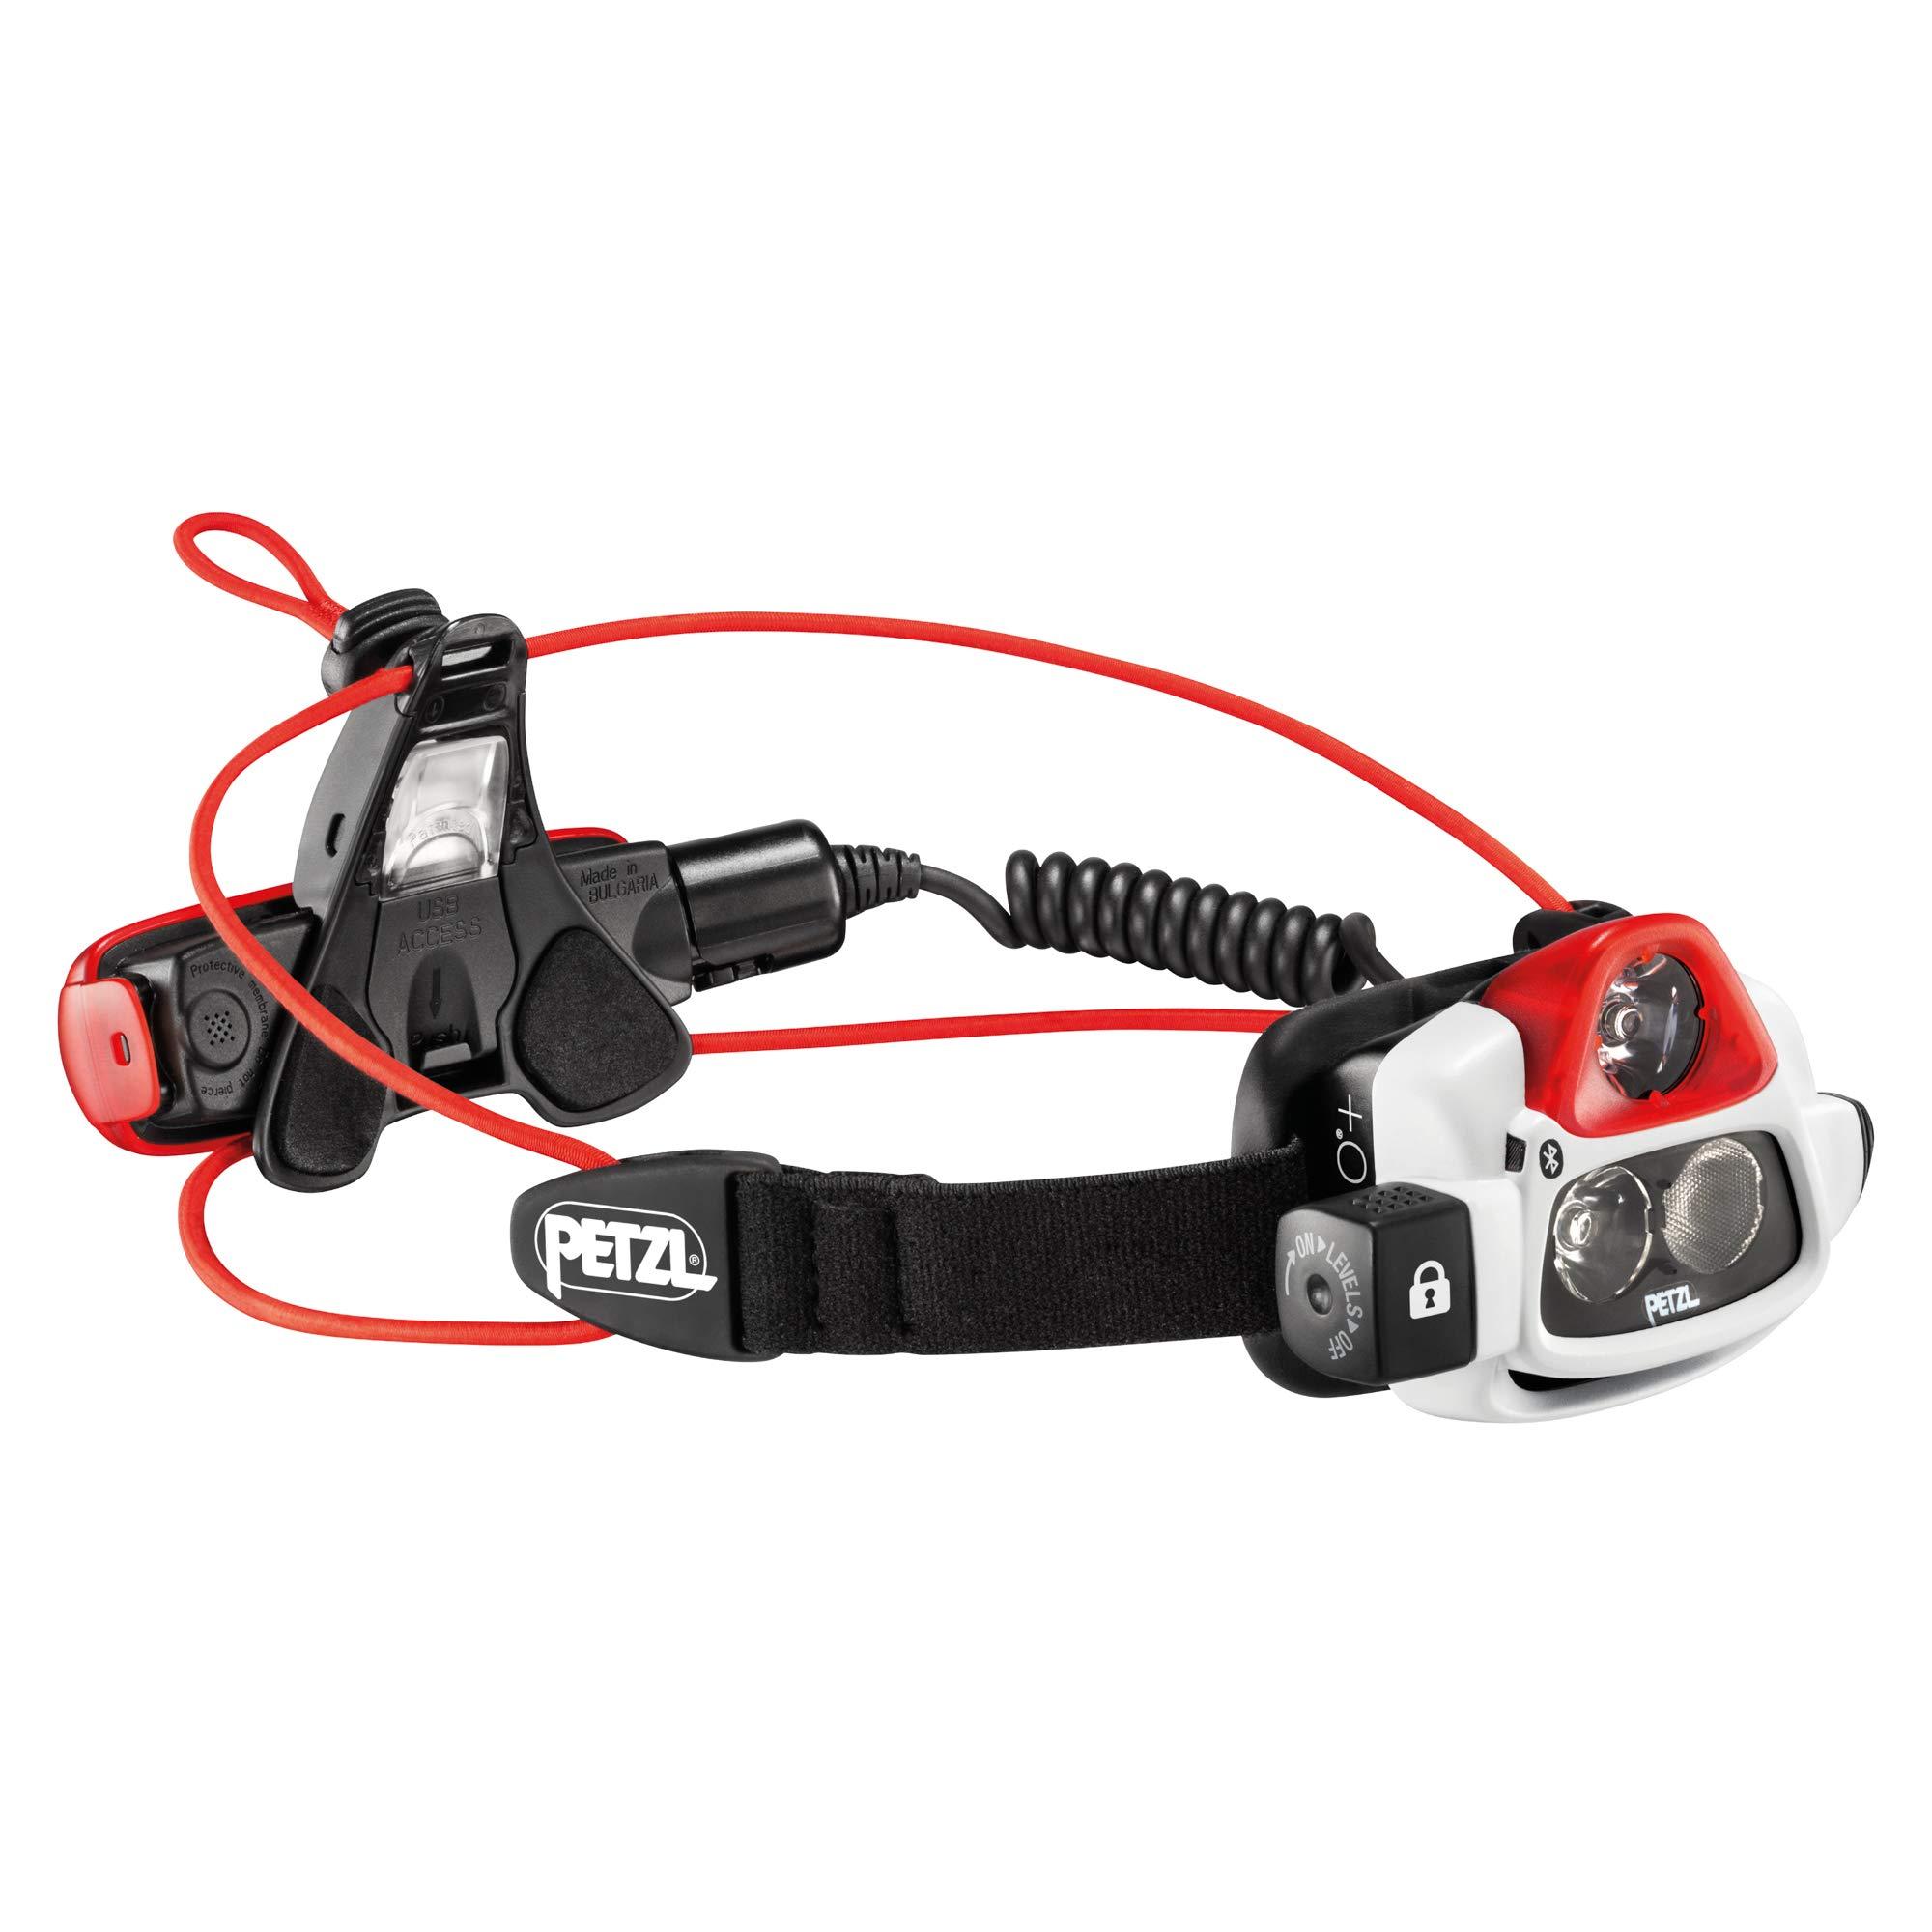 Petzl Erwachsene Nao Plus Stirnlampe, Black/Red, One Size